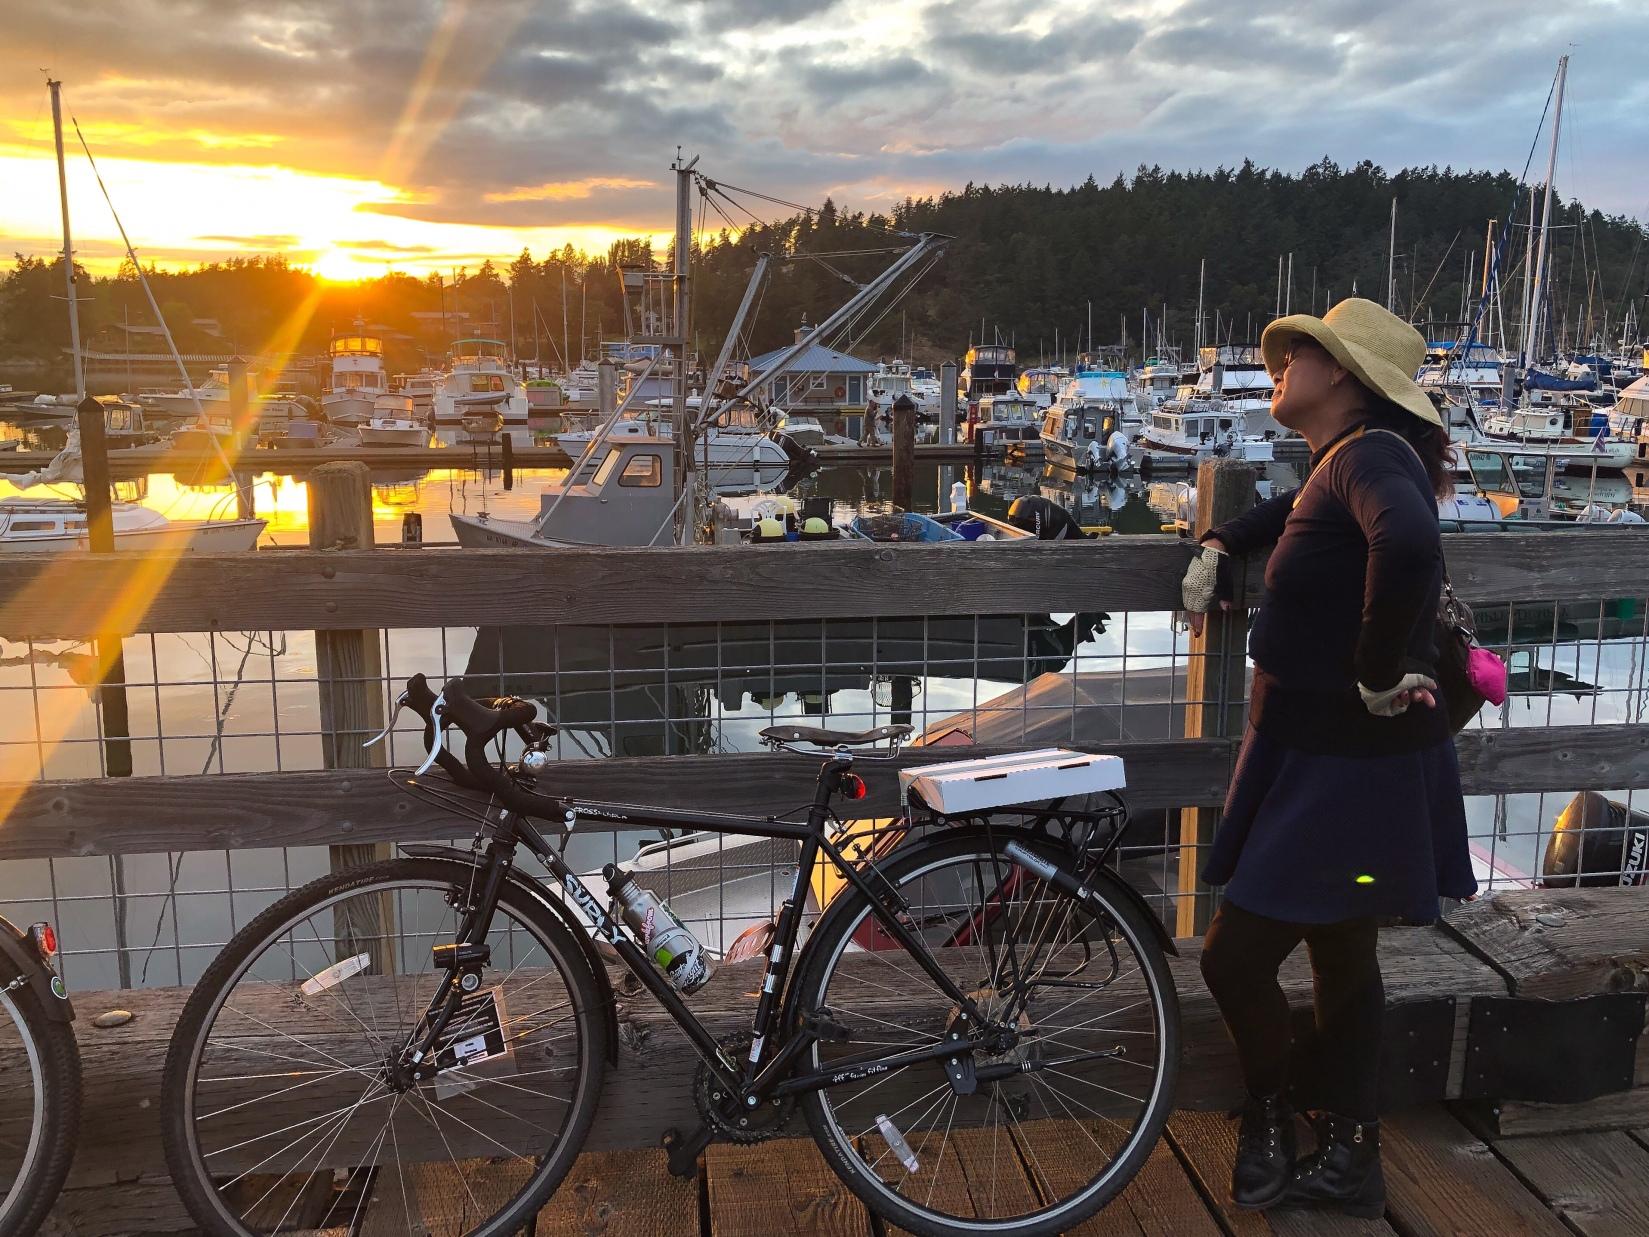 REMINDER: Sunset/Moonrise Ride this Thursday, August 15